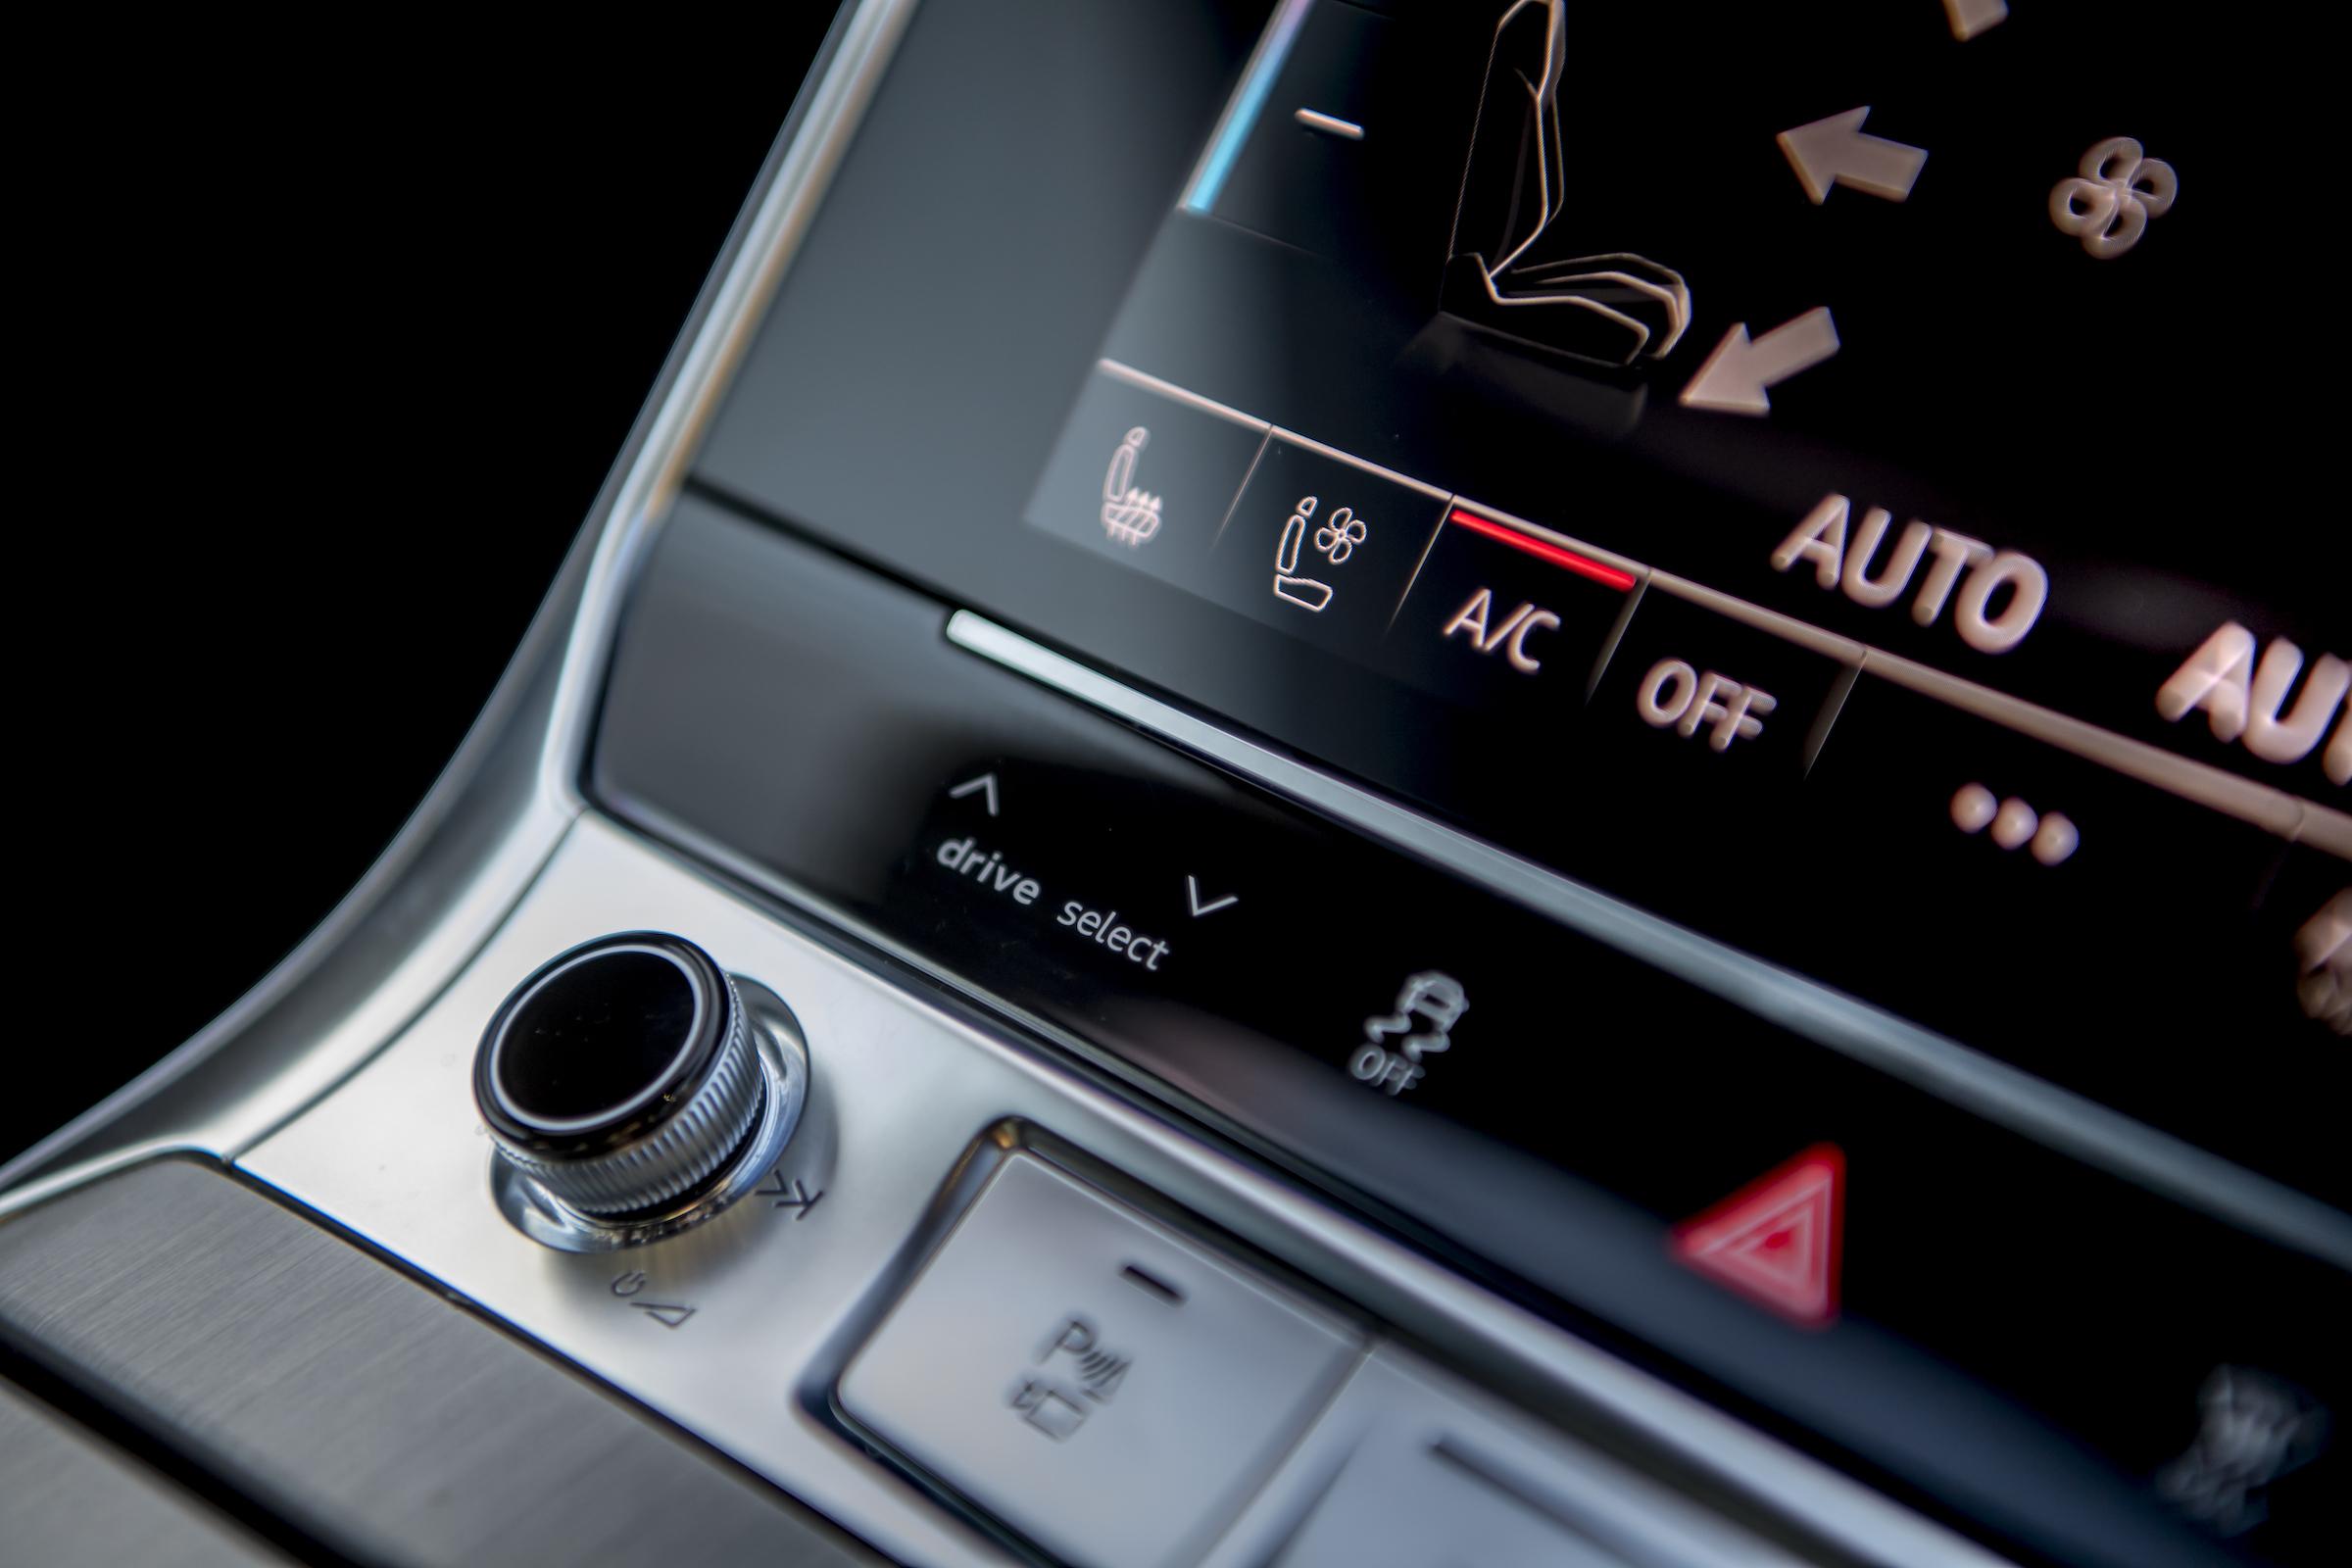 Audi RS6 interior center console controls close